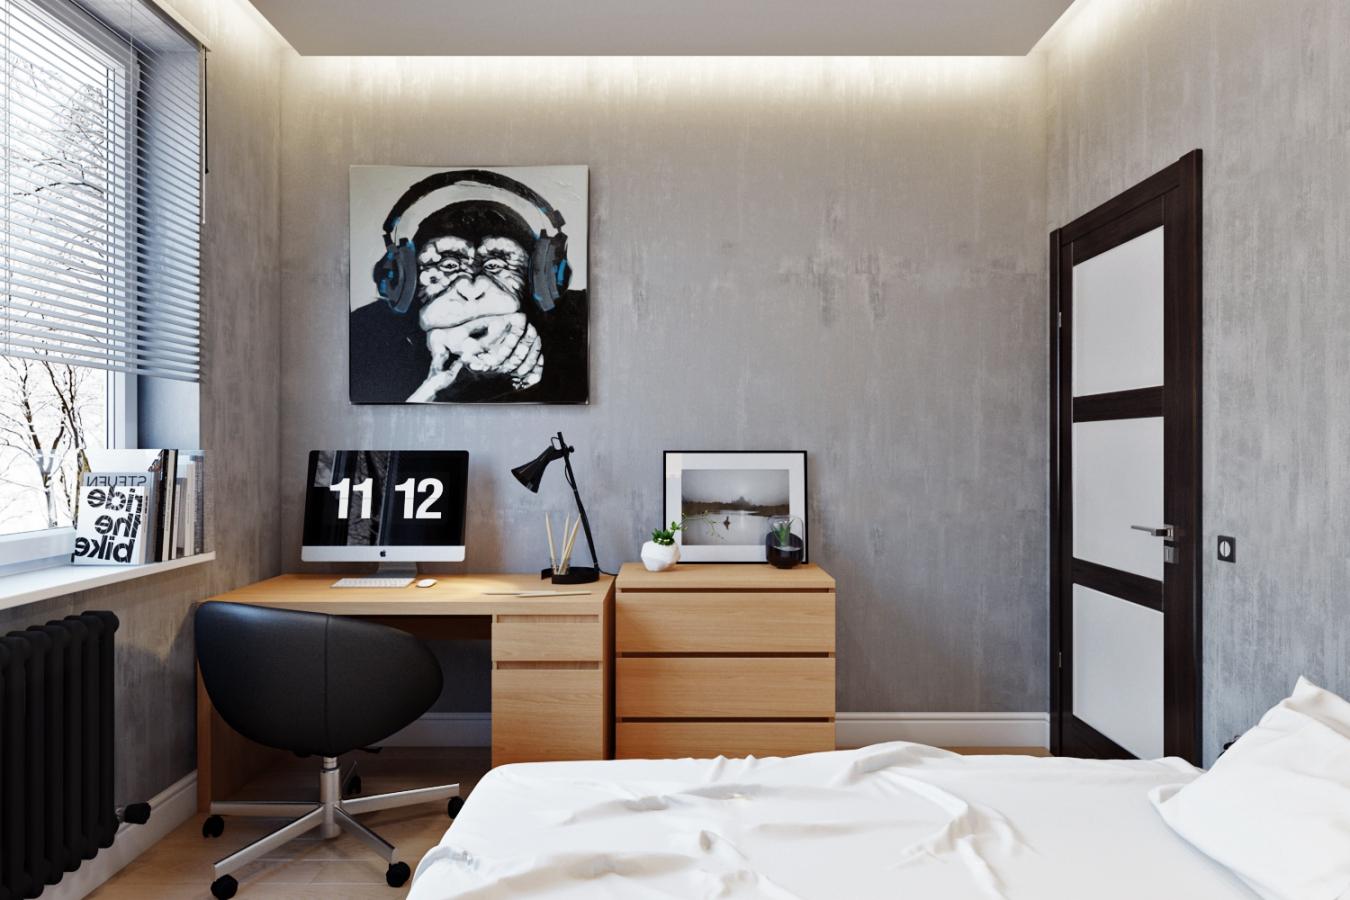 2017 12 11 5a2ebd6878ace - Интерьер юношеской комнаты